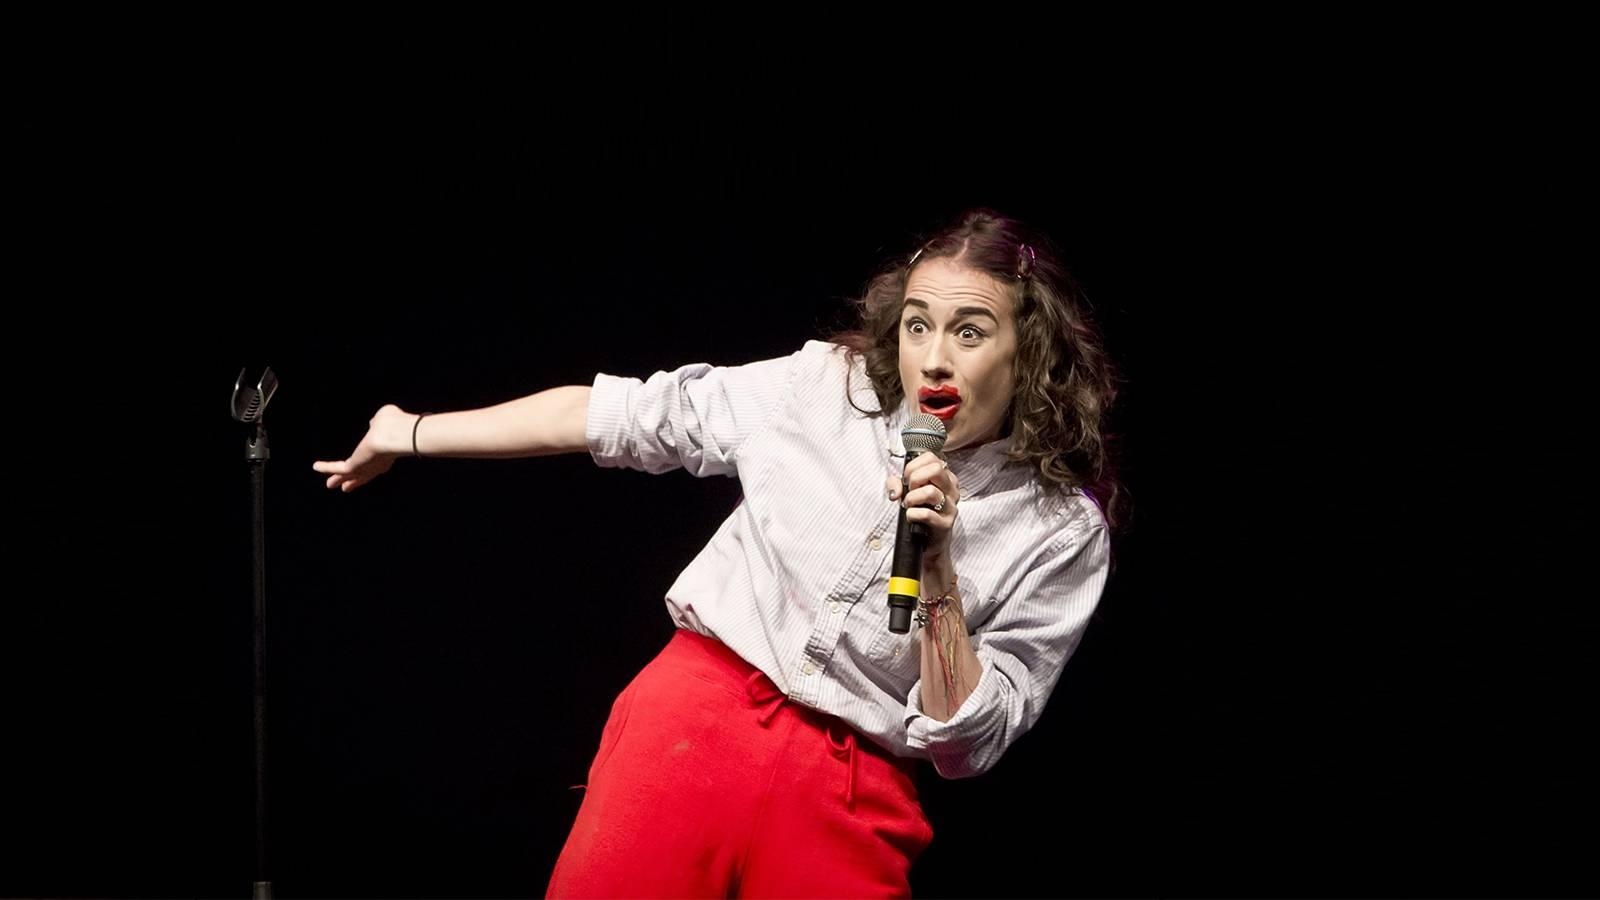 Miranda Sings (Rescheduled from 3/21)